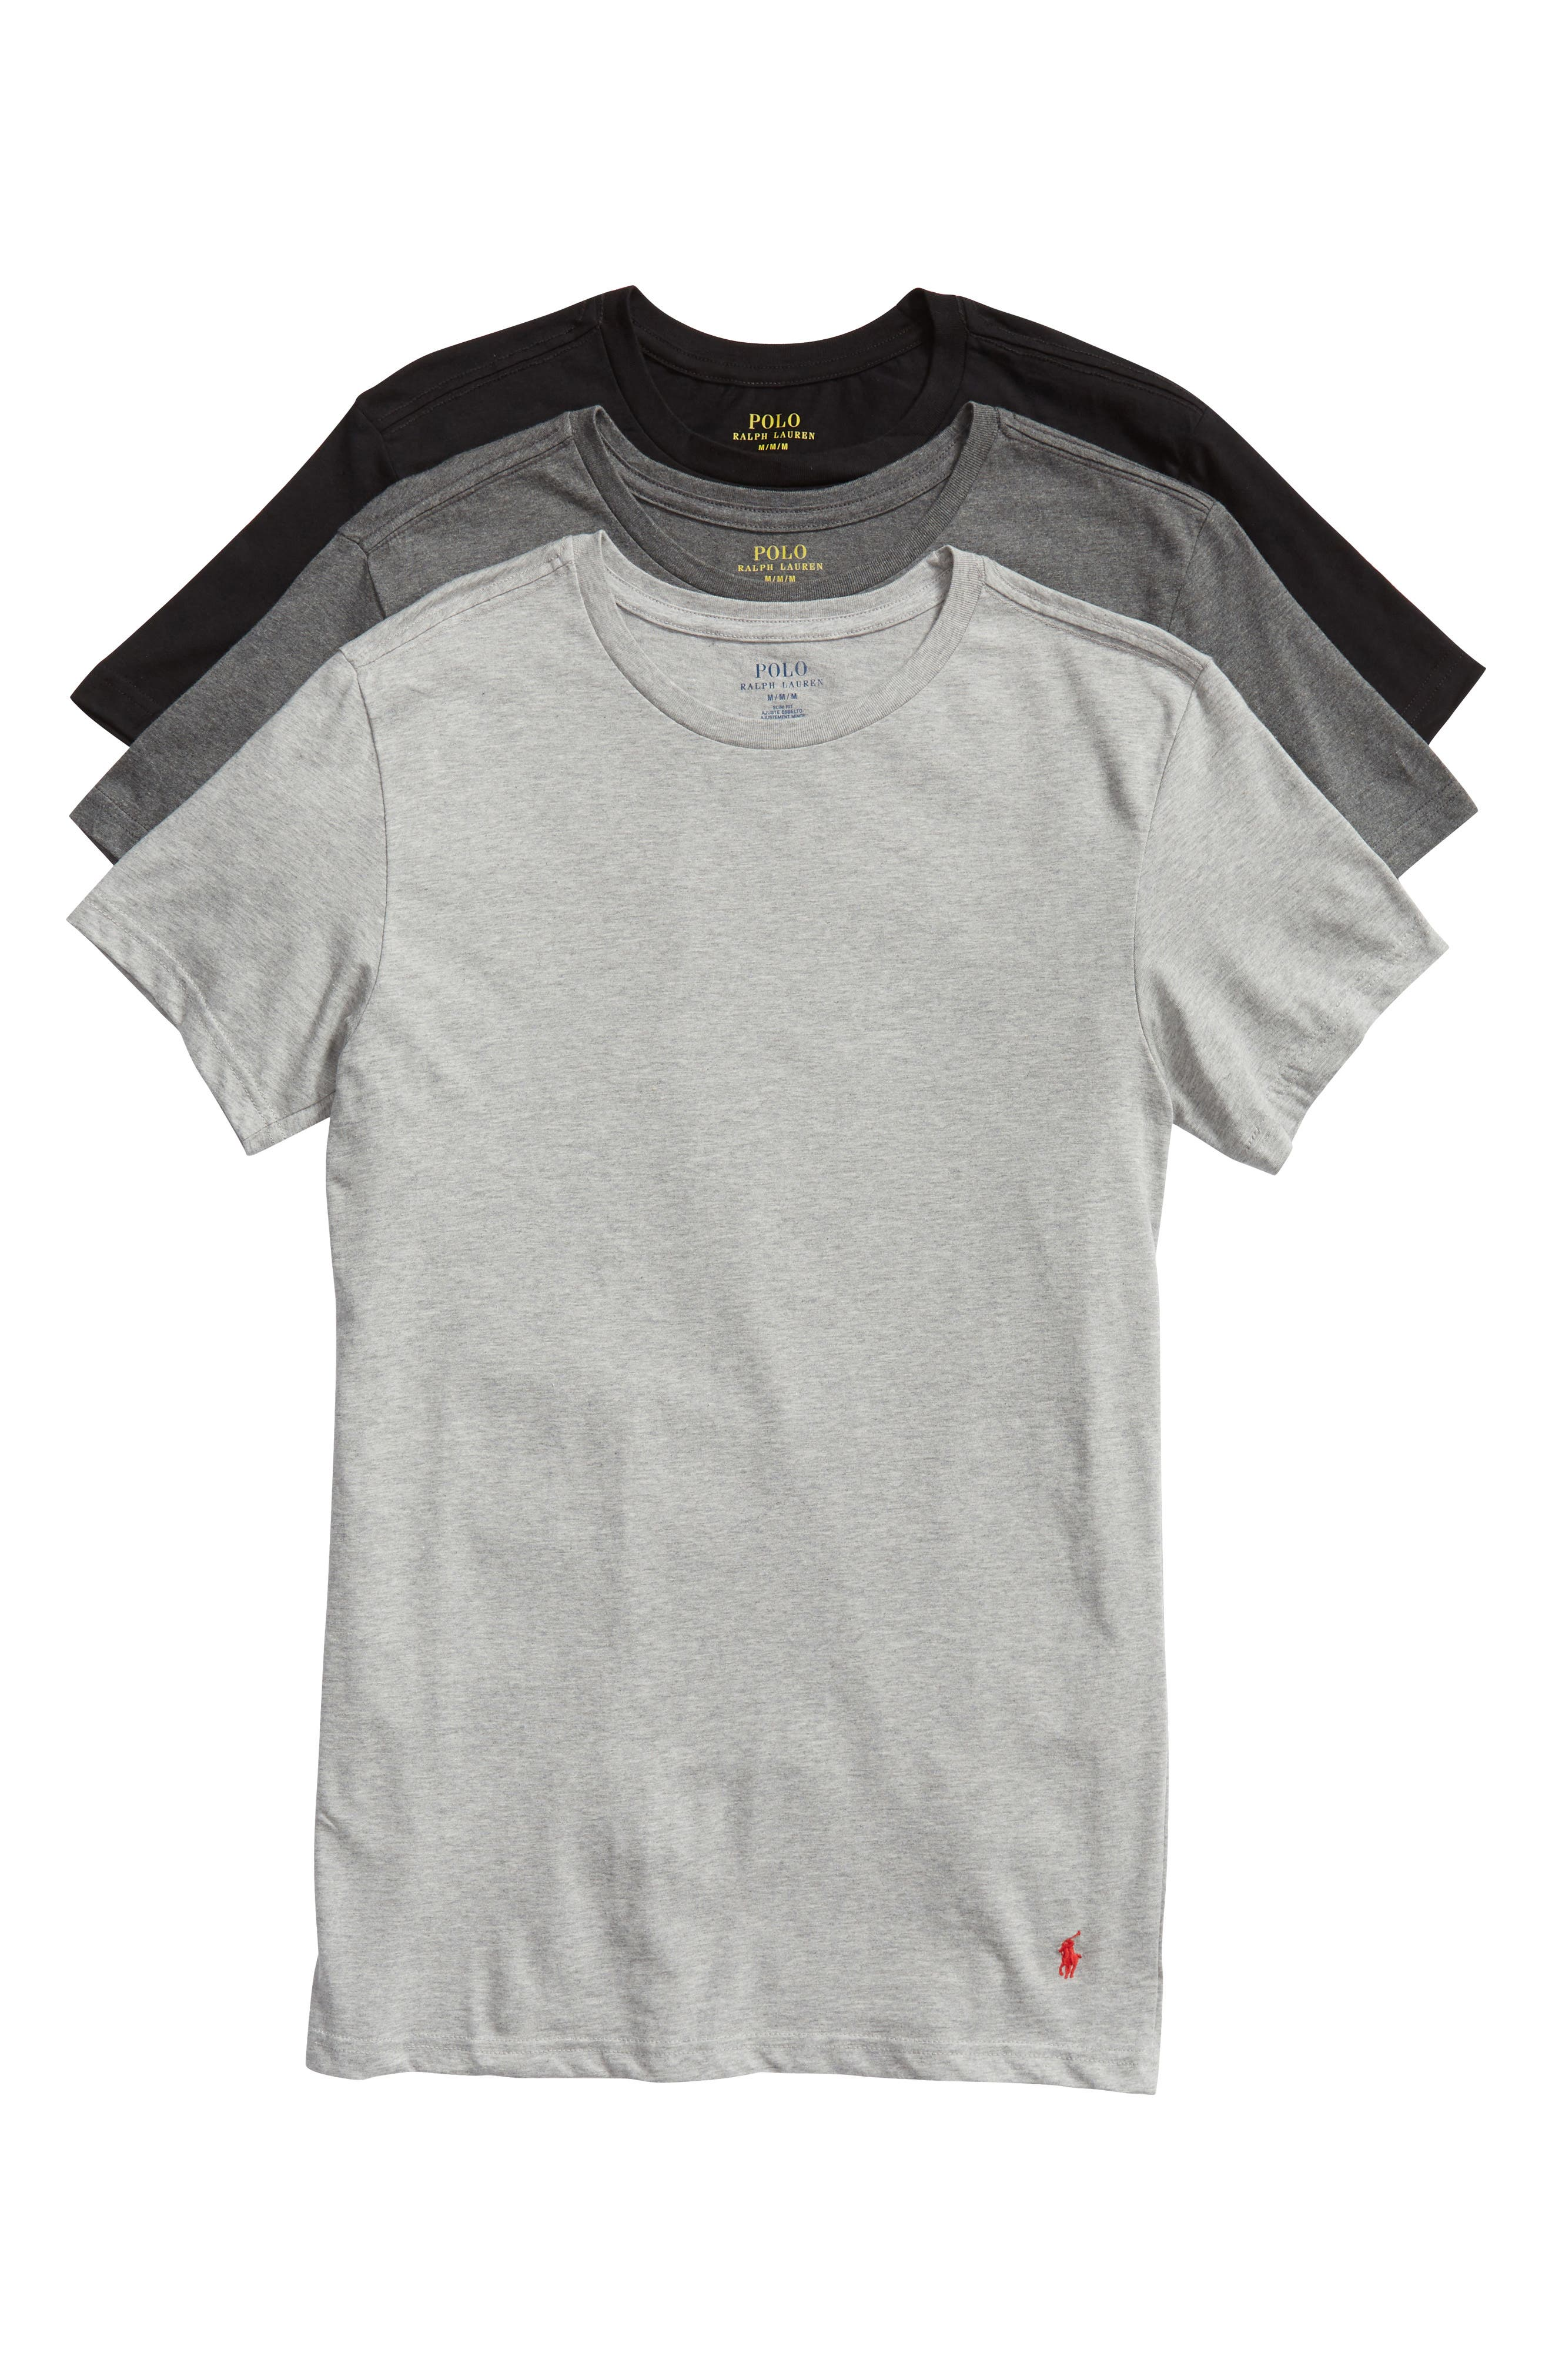 Polo Ralph Lauren 3 Pack Slim Fit Crewneck T Shirts Nordstrom